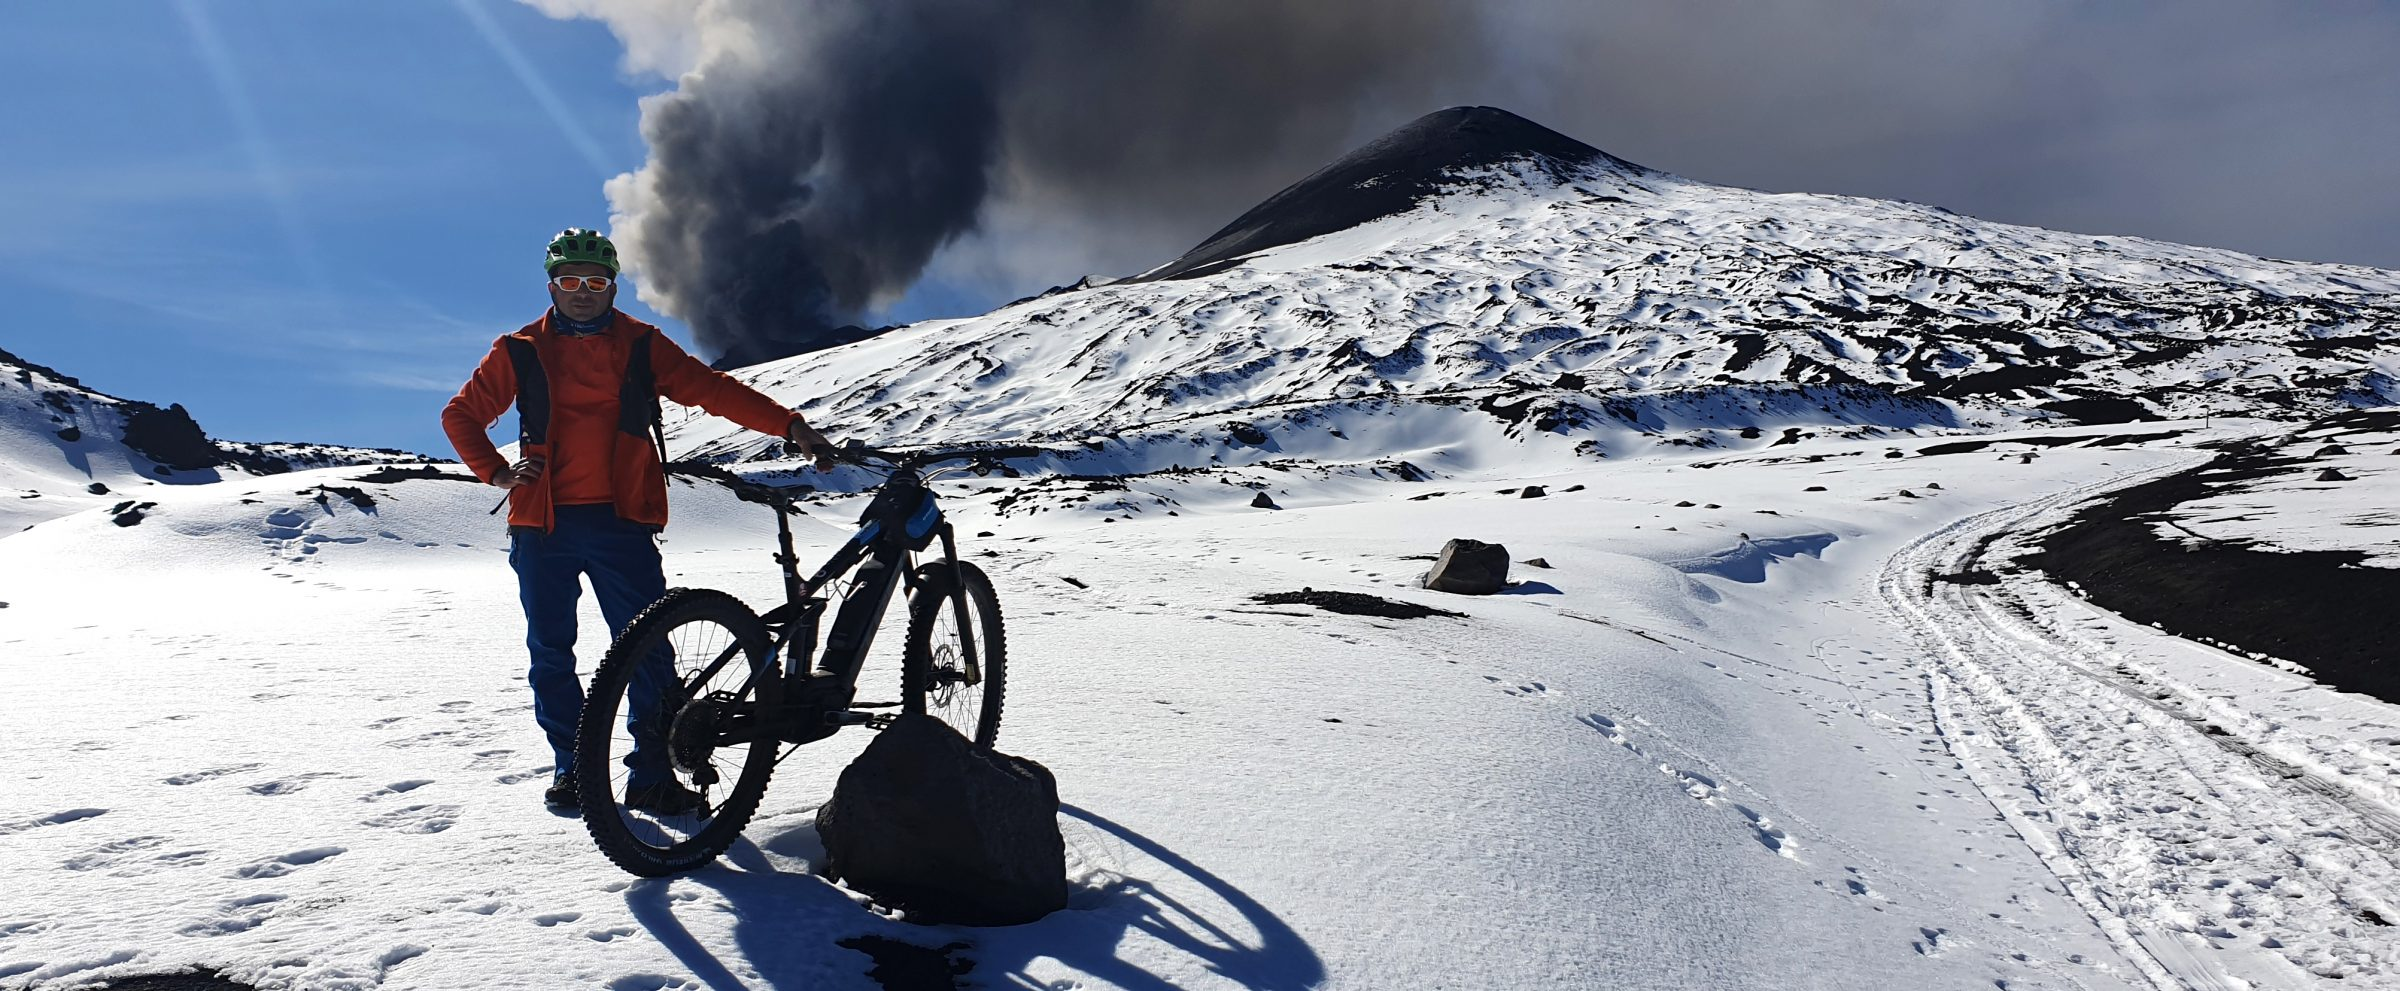 E-bike neve vulcano